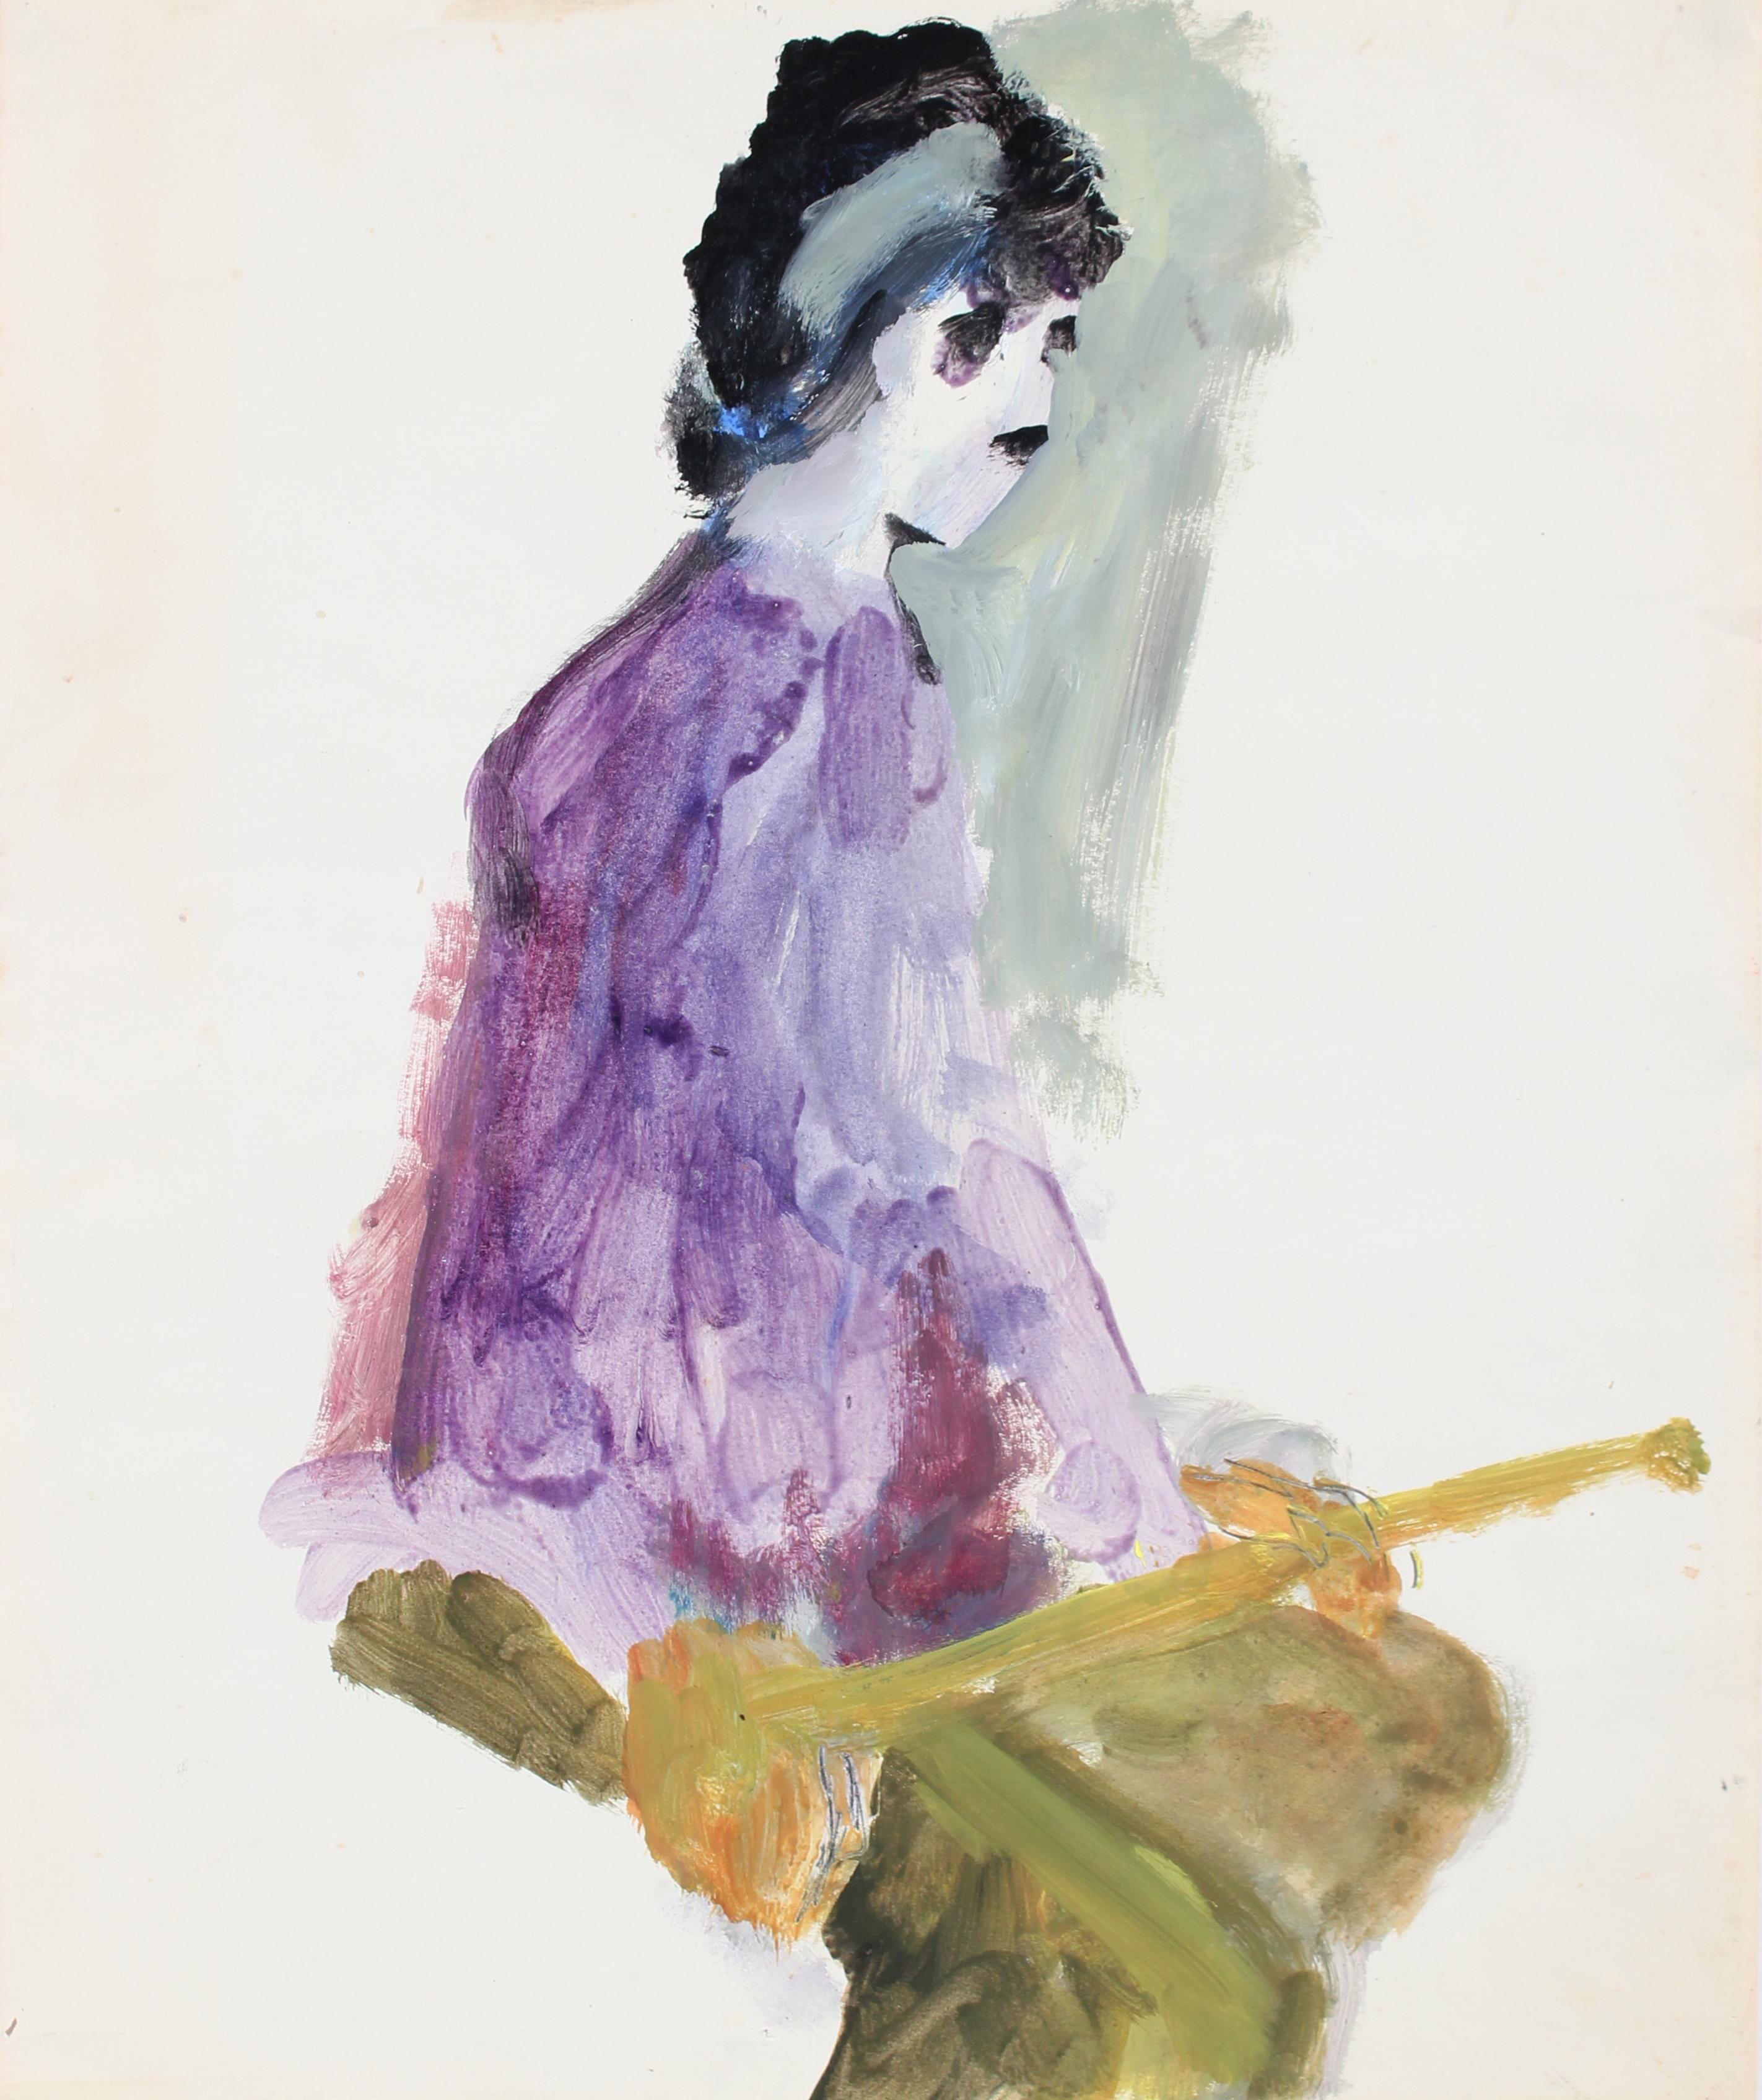 """Female in Lavendar Dress #41"" Bay Area Figurative Portrait"